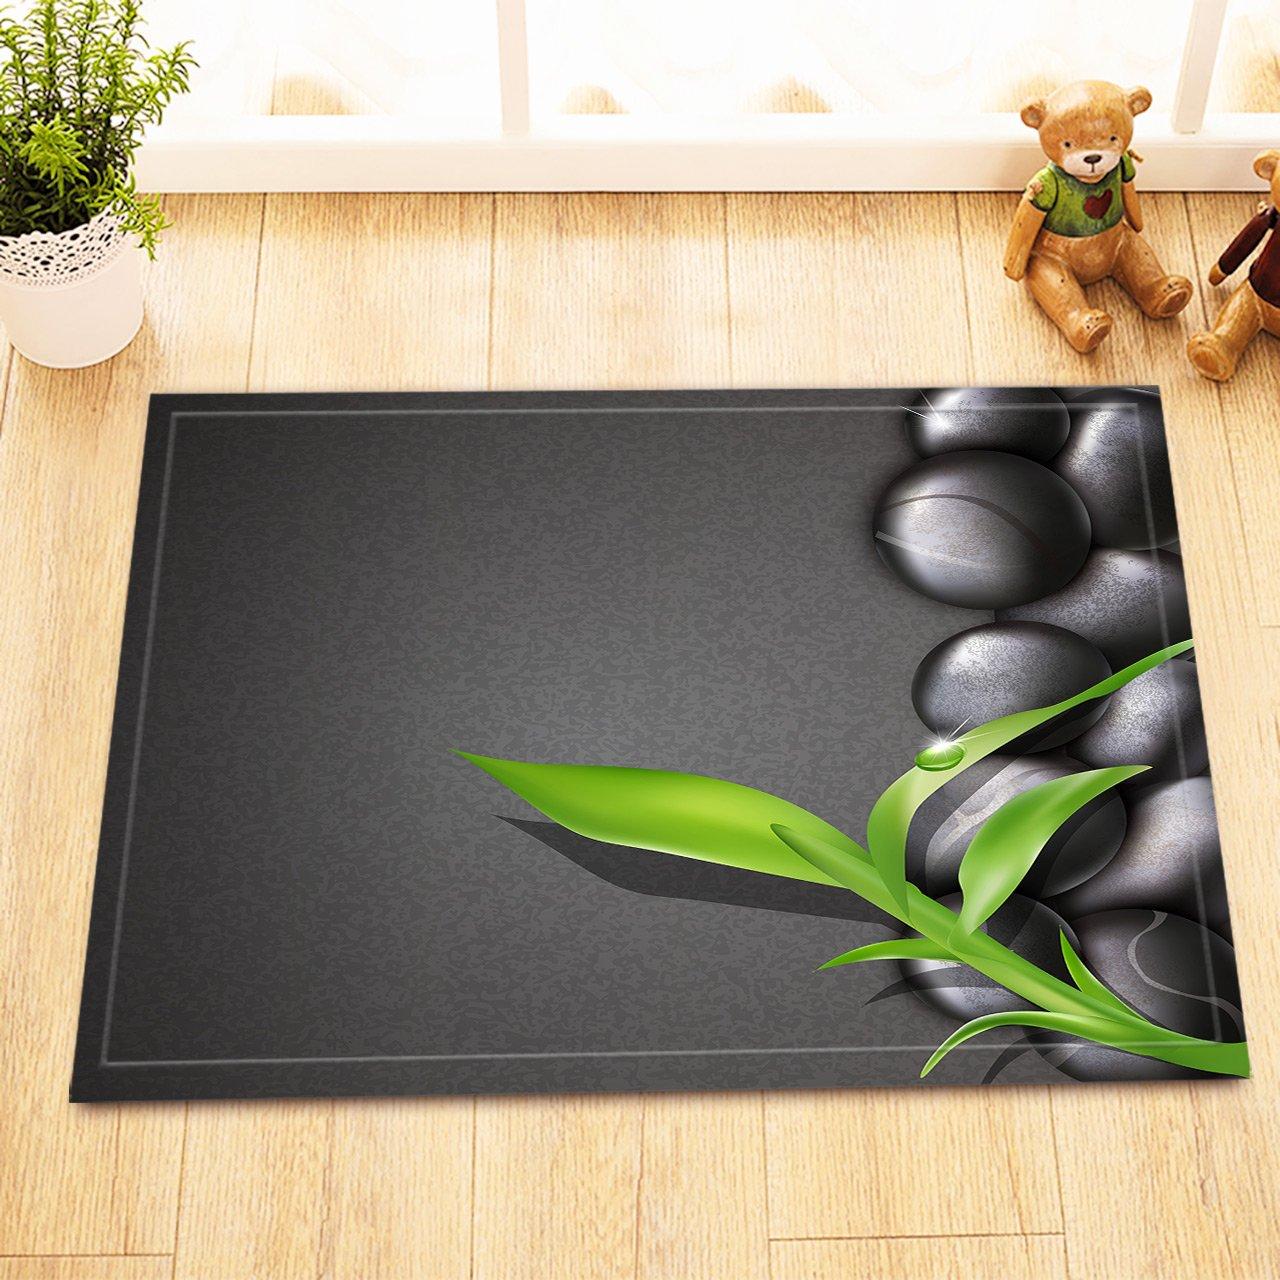 LB Green Bamboo Black Zen Stones Kids Bathroom Rugs, Anti Skip Rubber Backing Comfortable Soft Surface, Massage Spa Meditation Decor 15 x 23 Inches